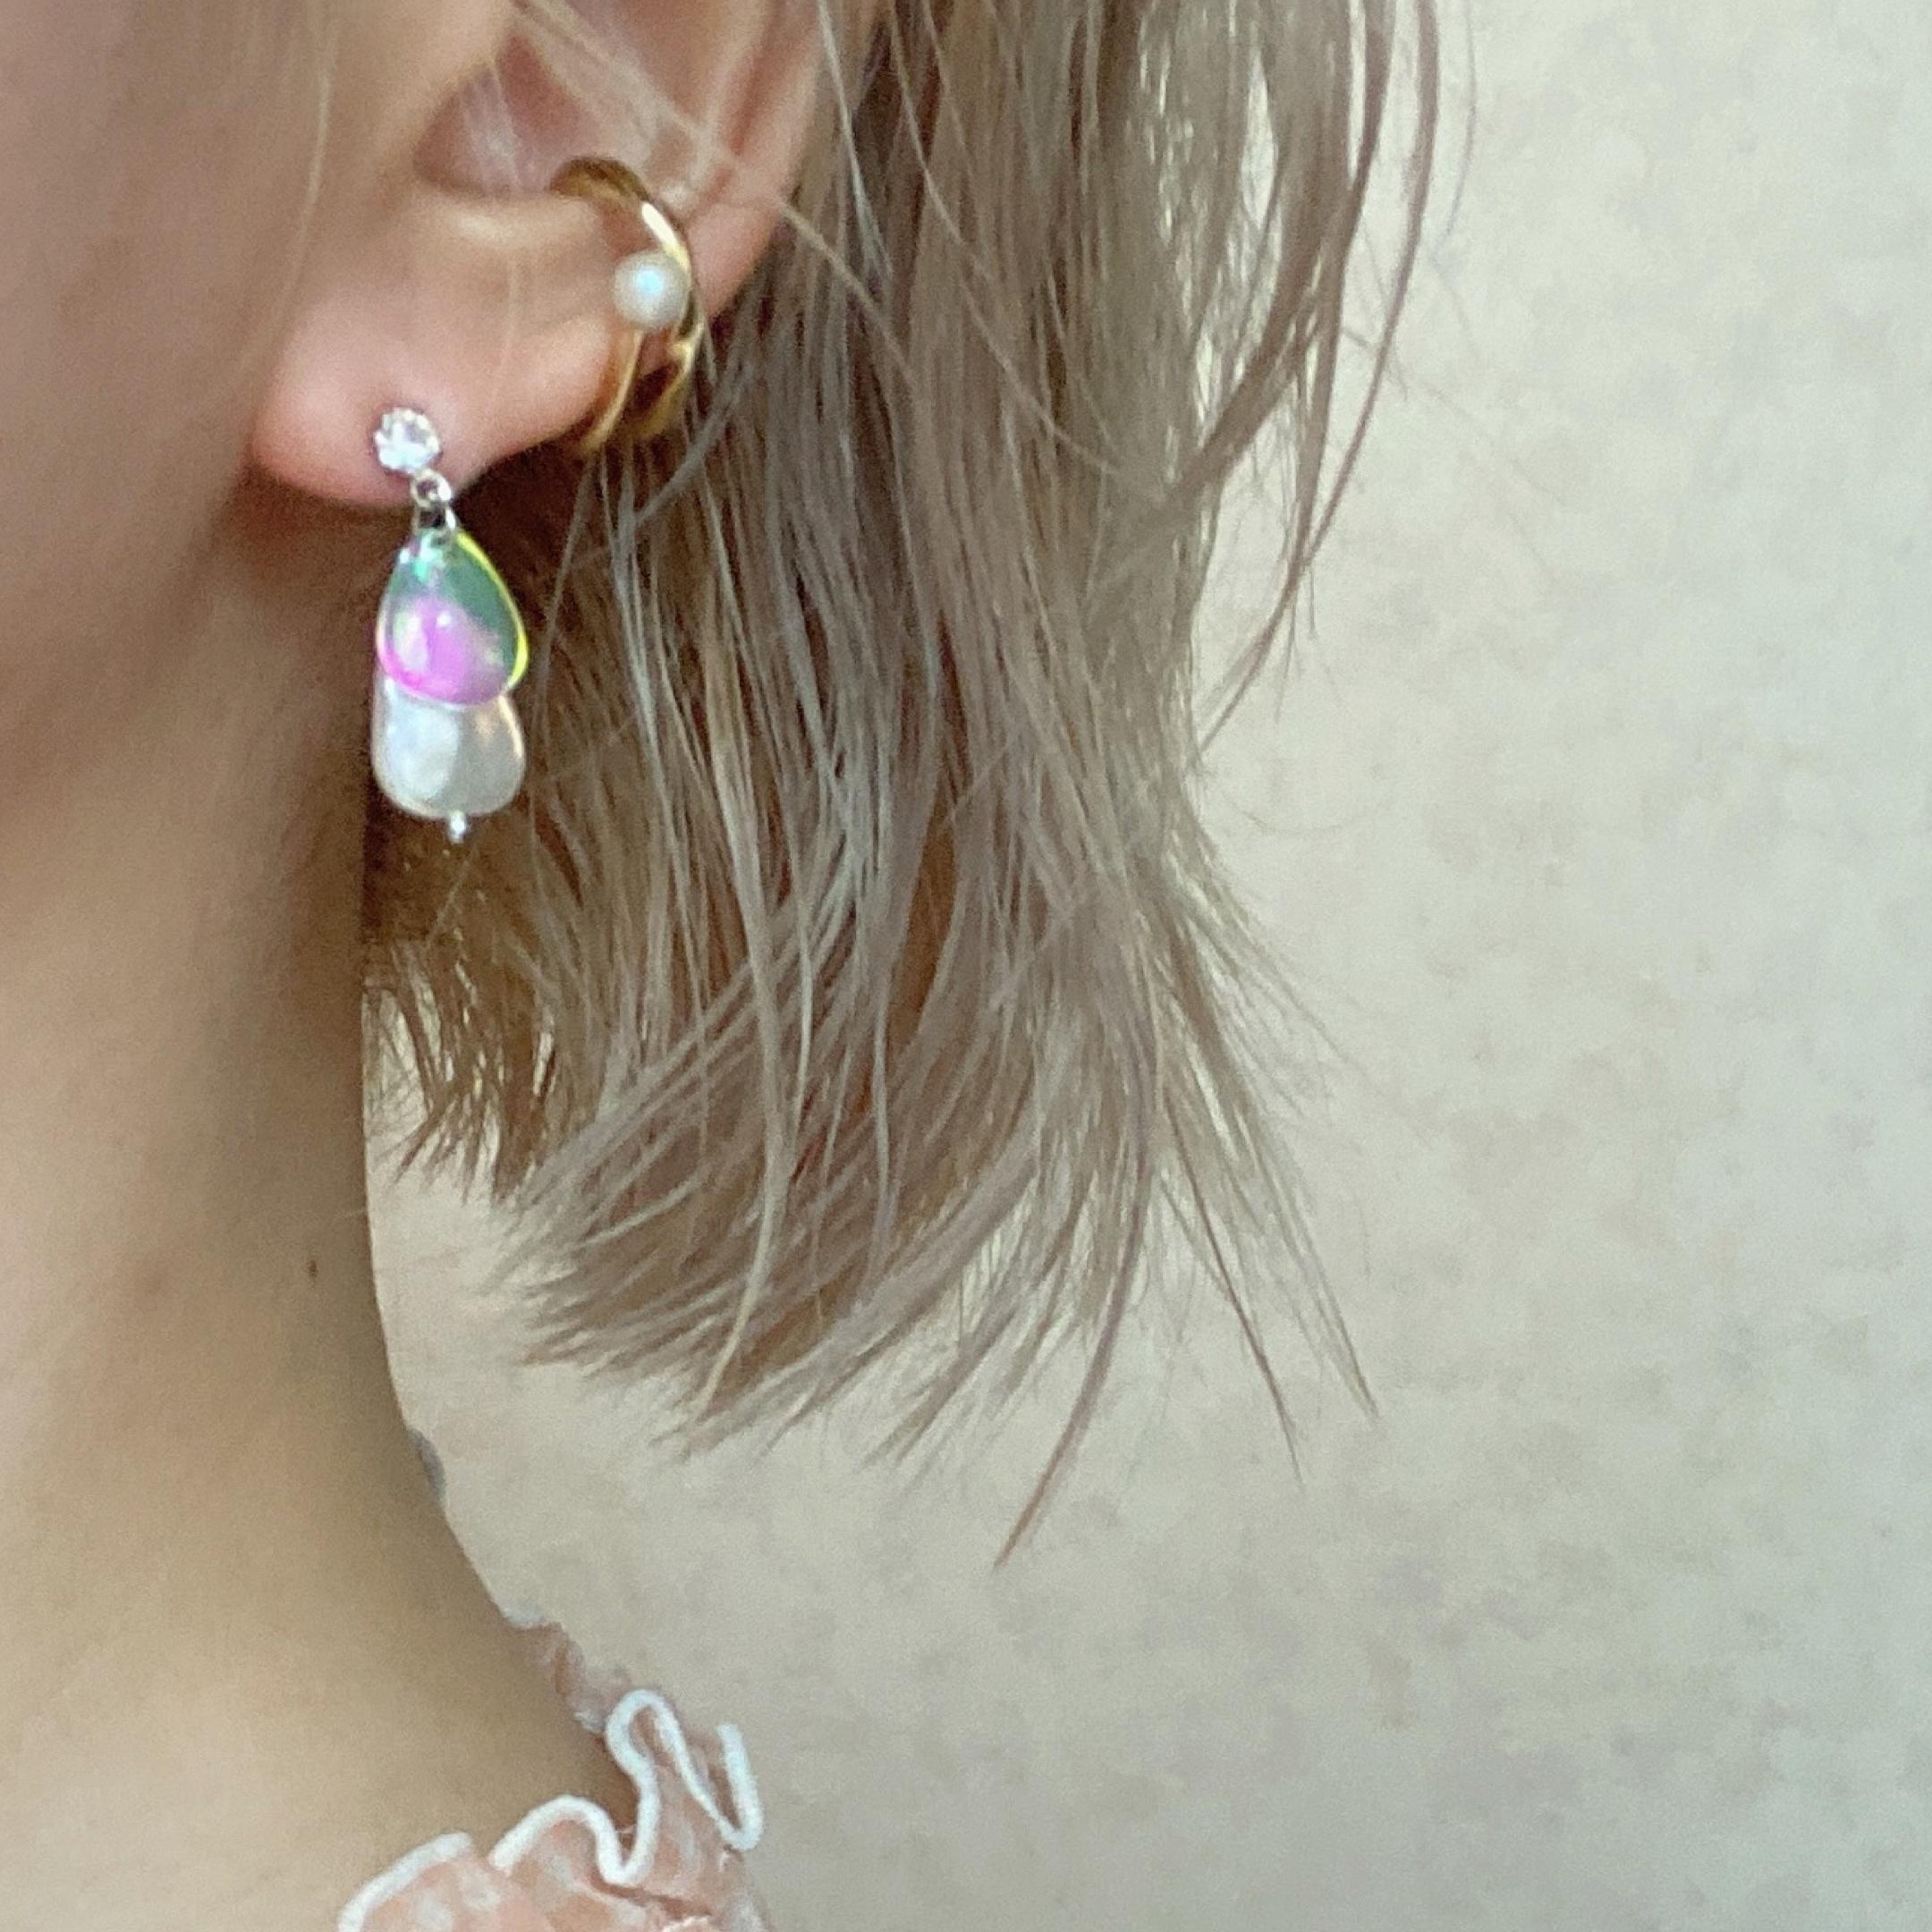 yurina double stone pierce